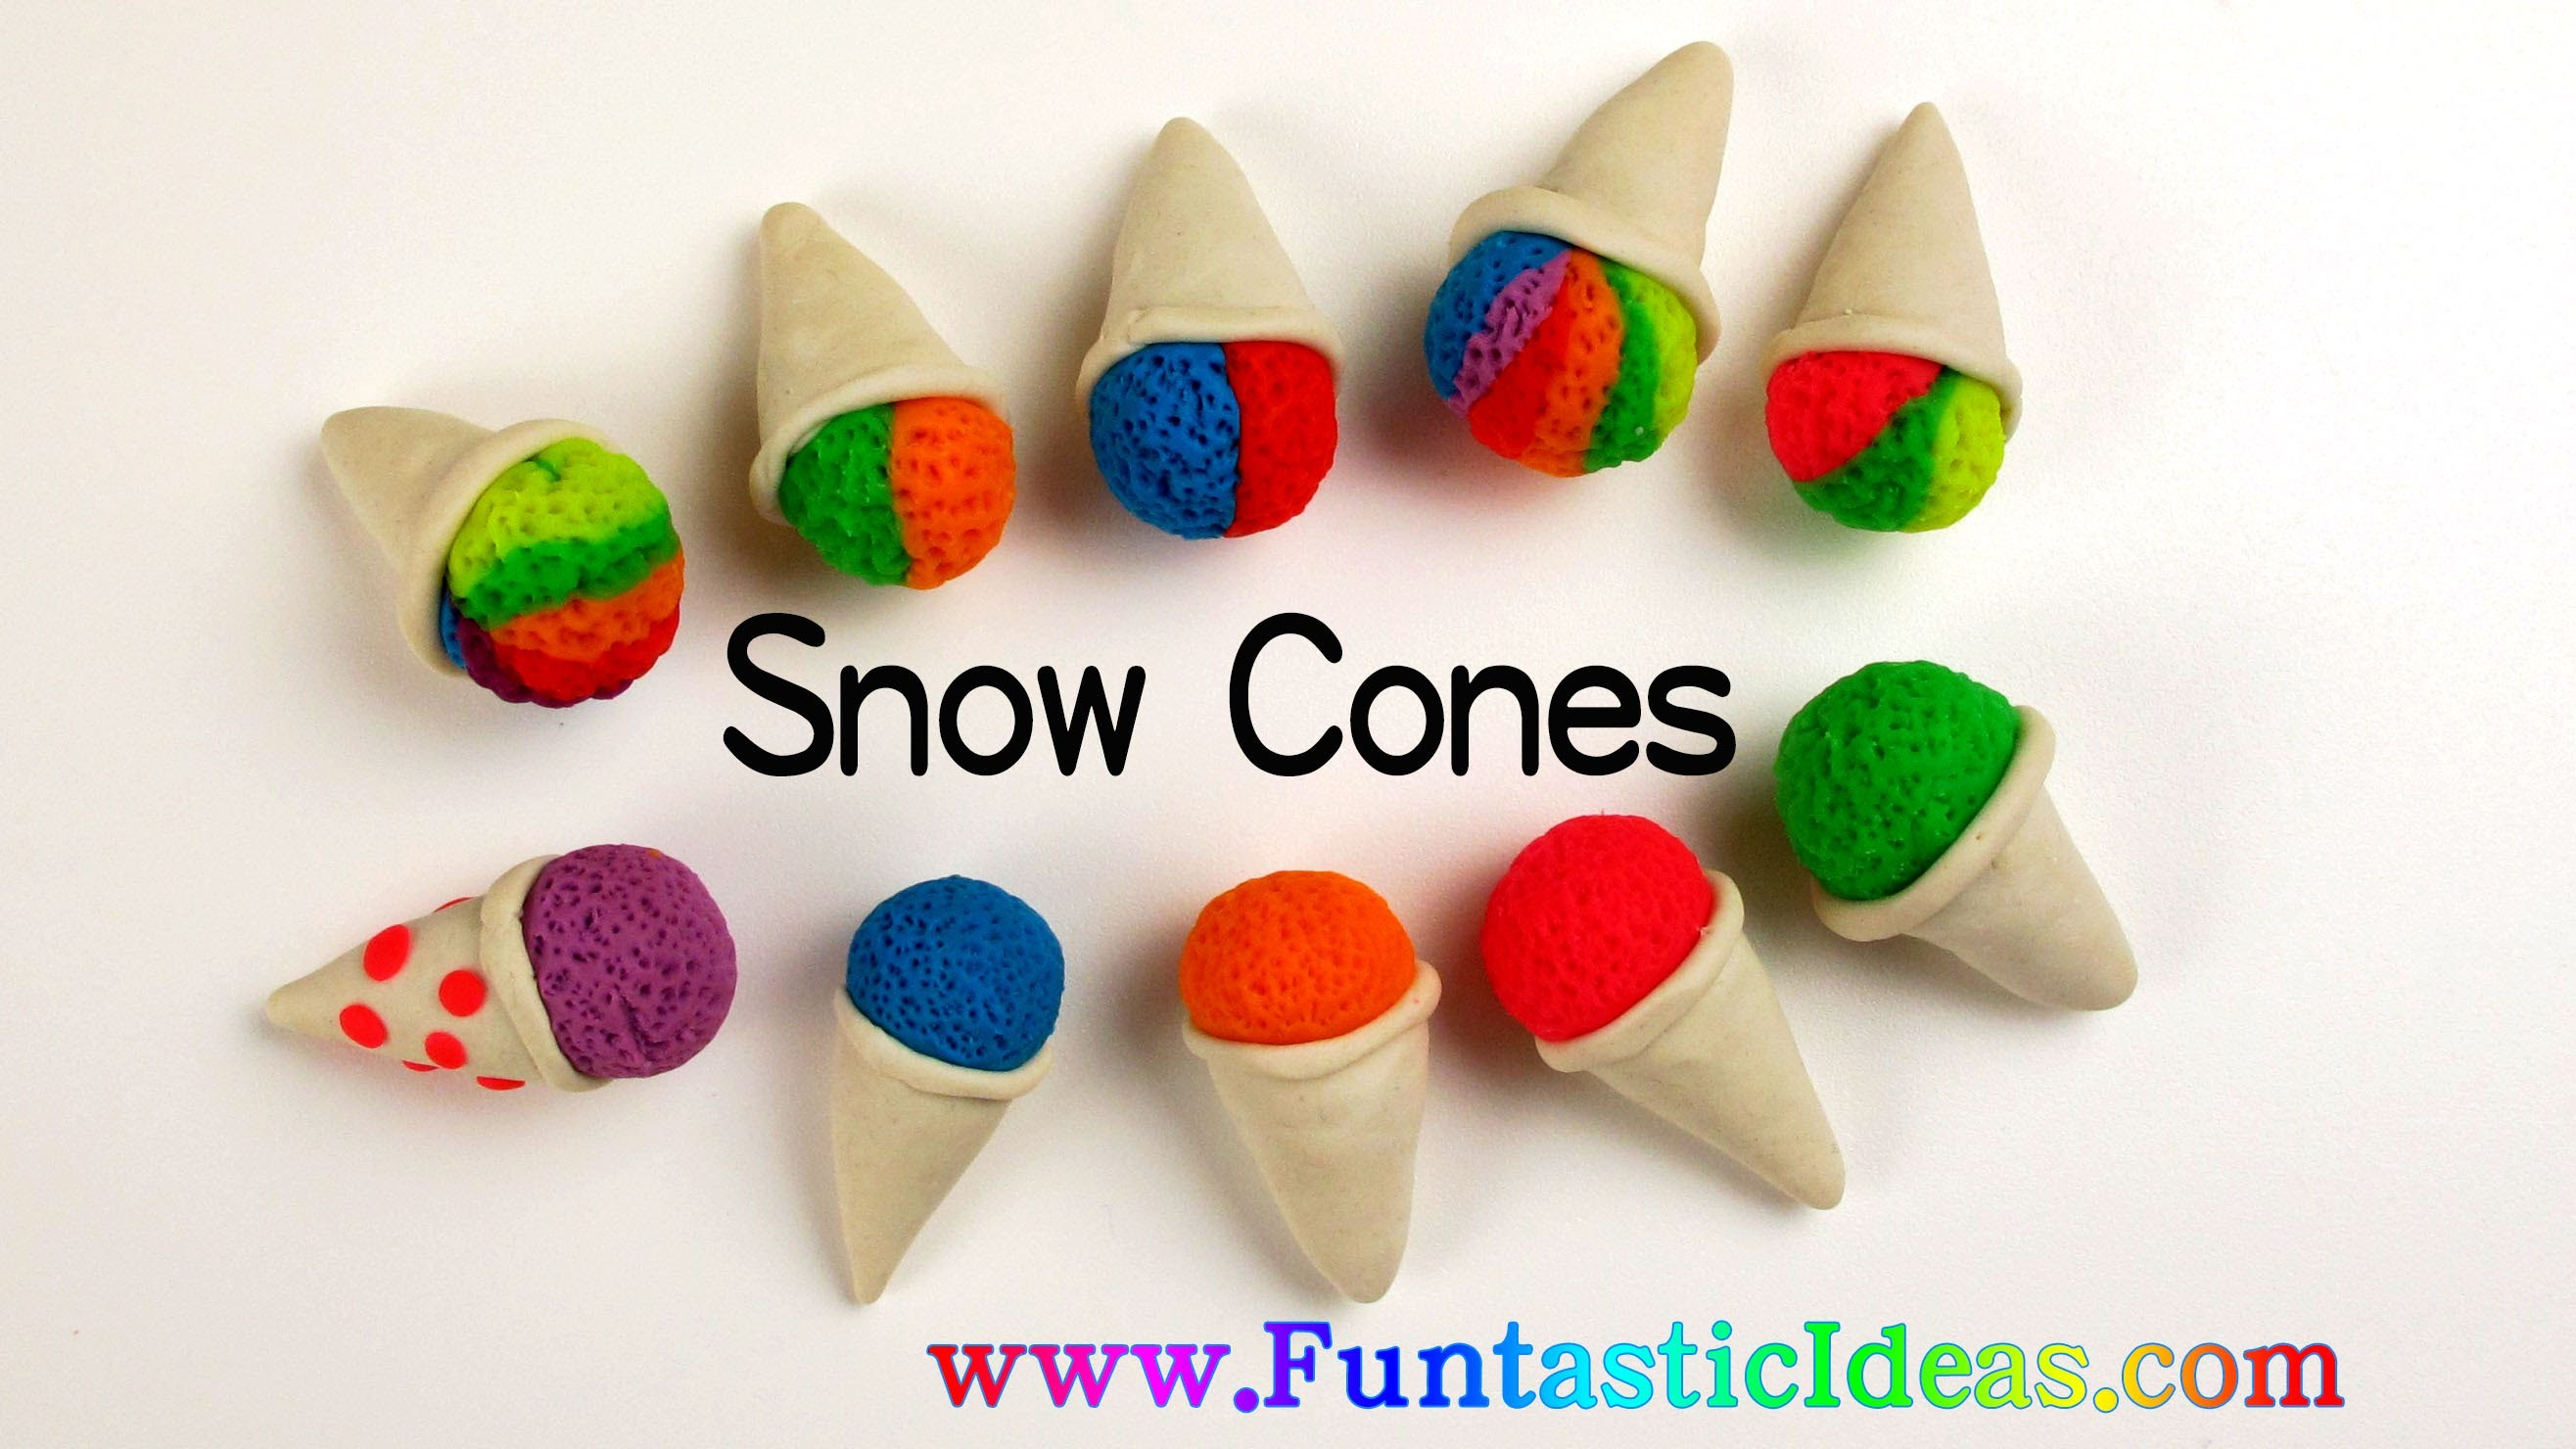 Play Doh Snow Cones.Rainbow Snow Cone.Two Colors Snow Cones.Ice Cream Mini - How to by Funstic Ideas